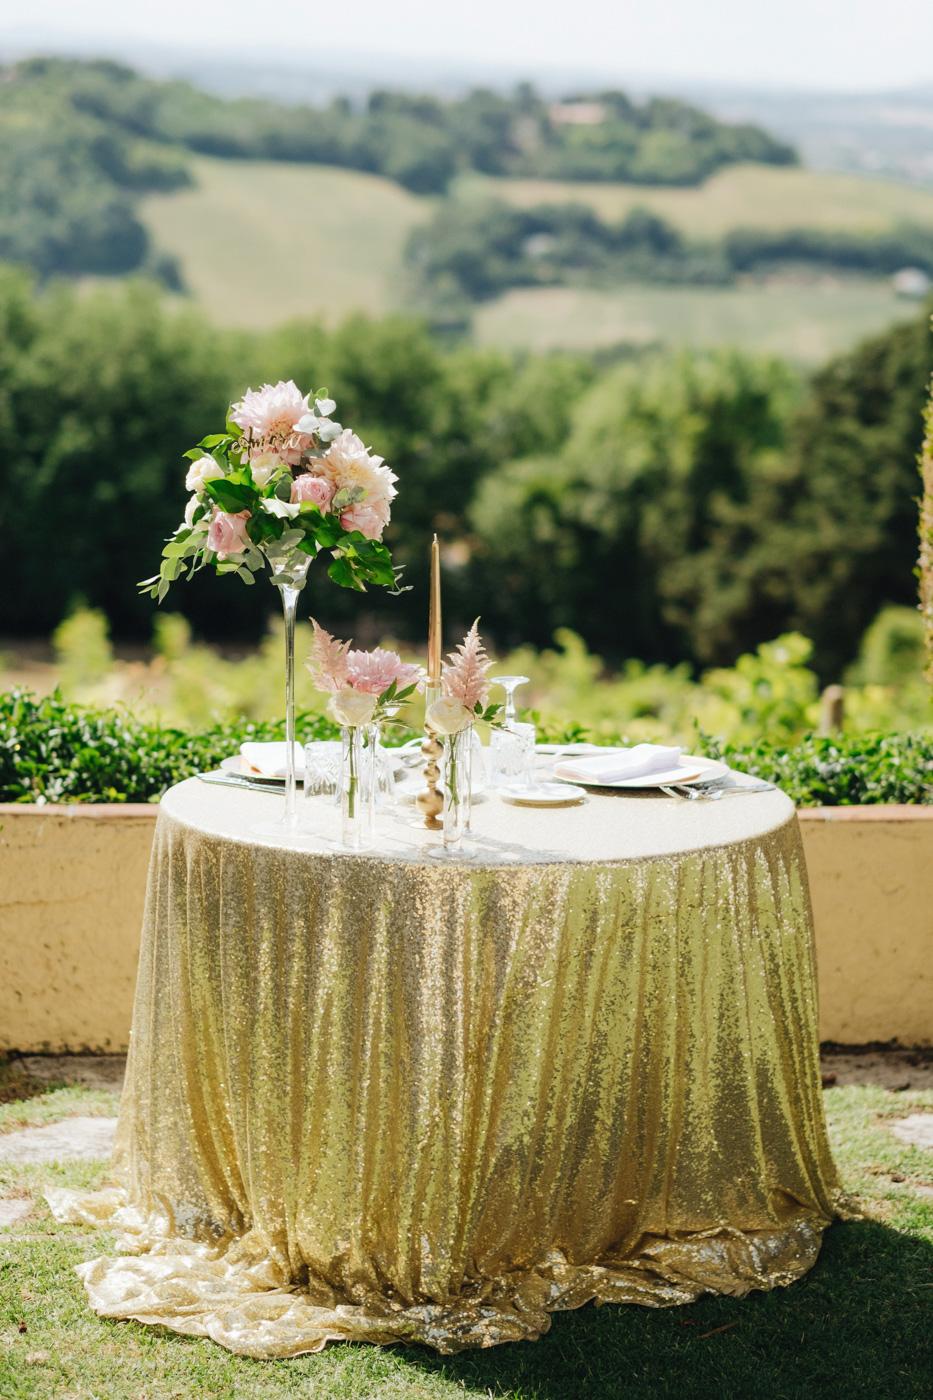 Matrimoni all'italiana wedding photographer italy-13.jpg